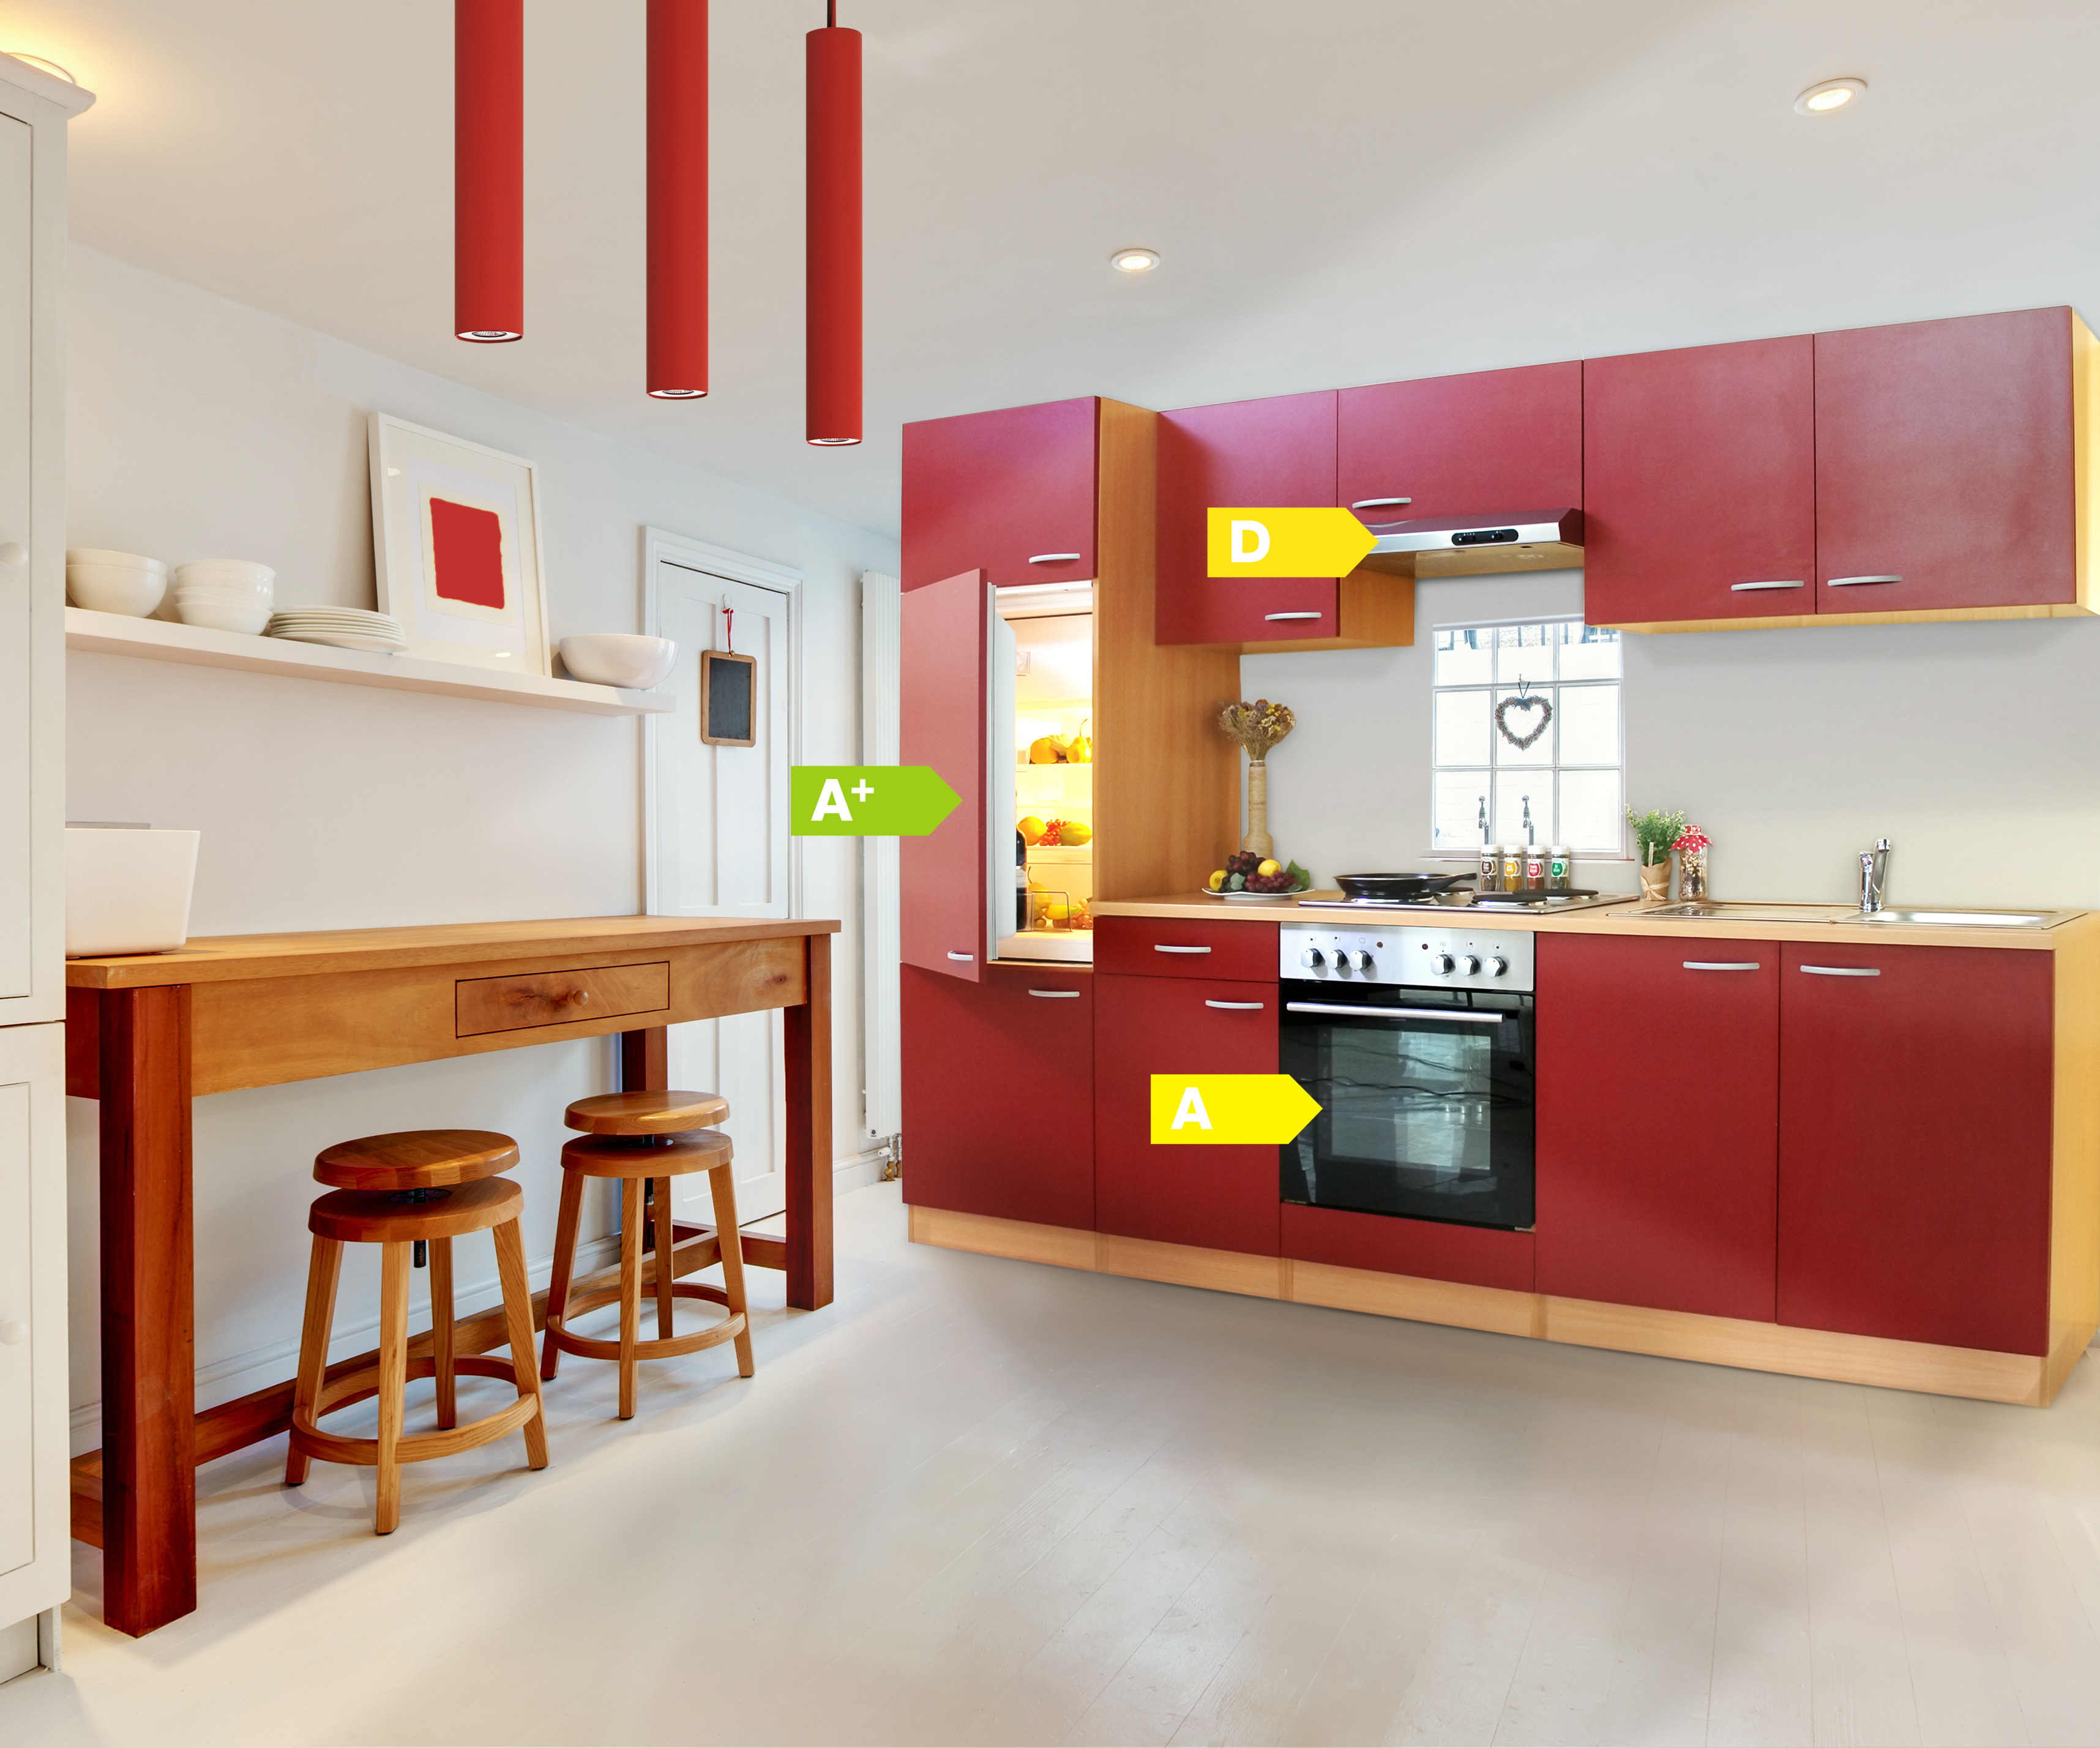 Ikea küche zahlung bei lieferung. küche weiss keramik